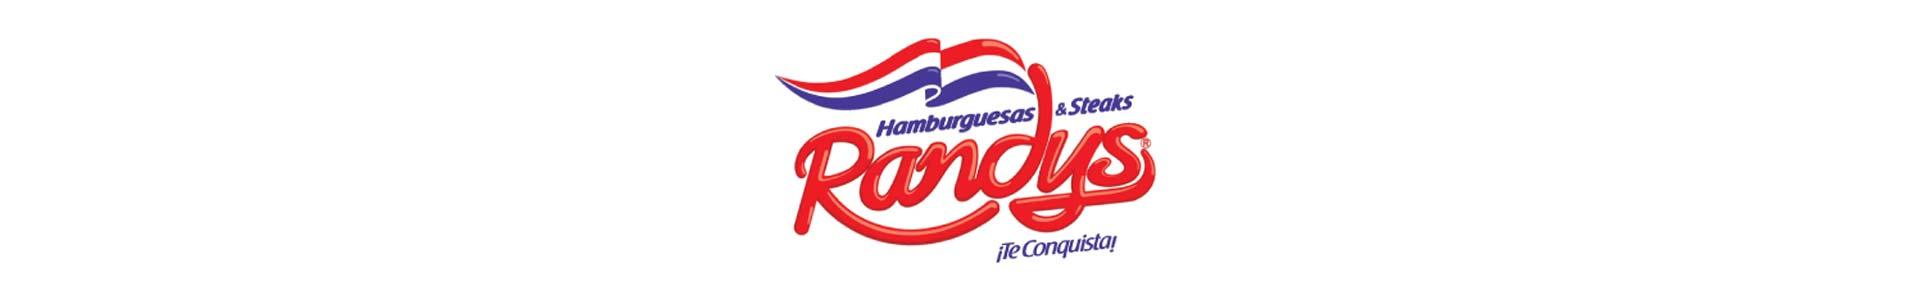 _Formato-header-randys